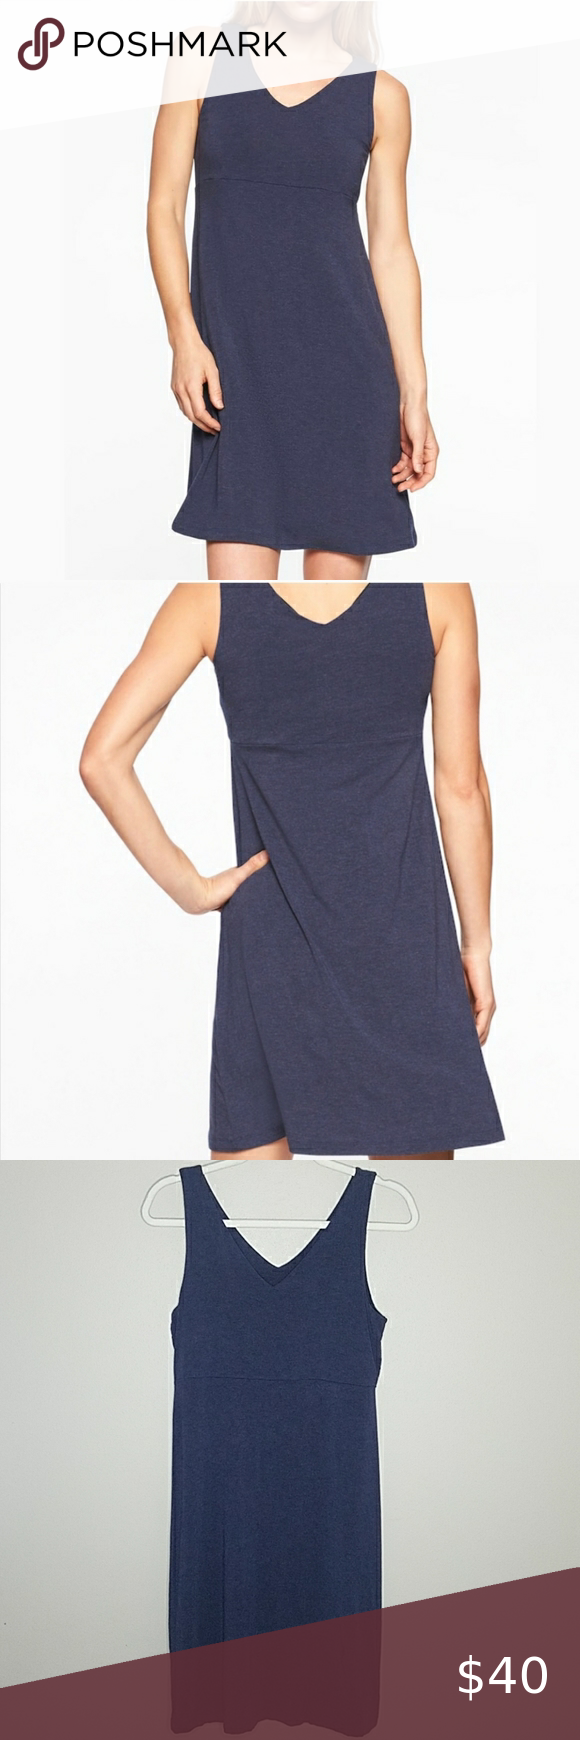 Athleta Santorini Dress, Size Medium Athleta Santorini Dress in Navy, Size Medium.  93% Modal, 7% Spandex.  Measures approximately 37